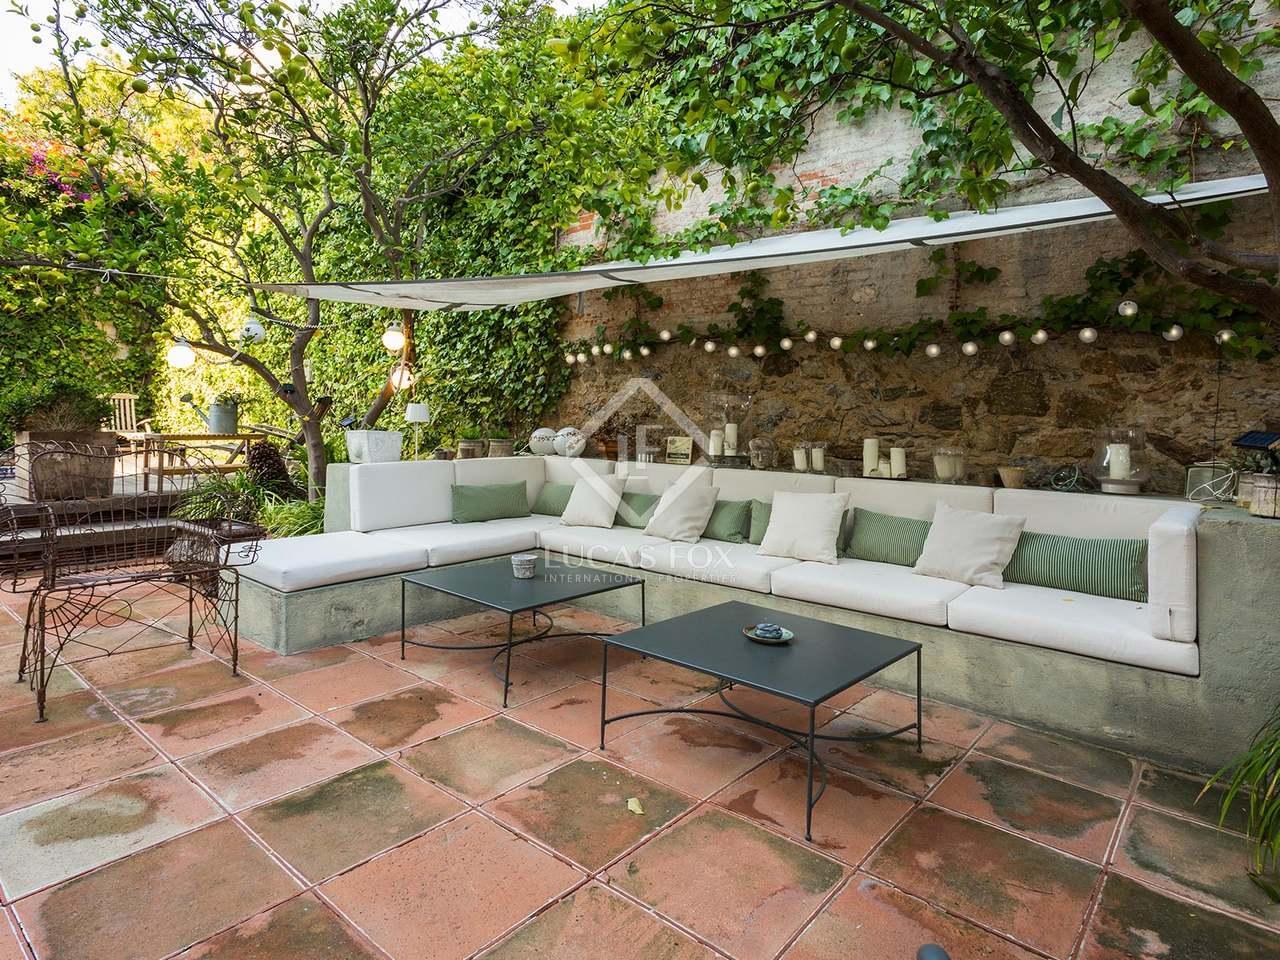 Characterful house with pool for sale zona alta barcelona - Zona alta barcelona ...